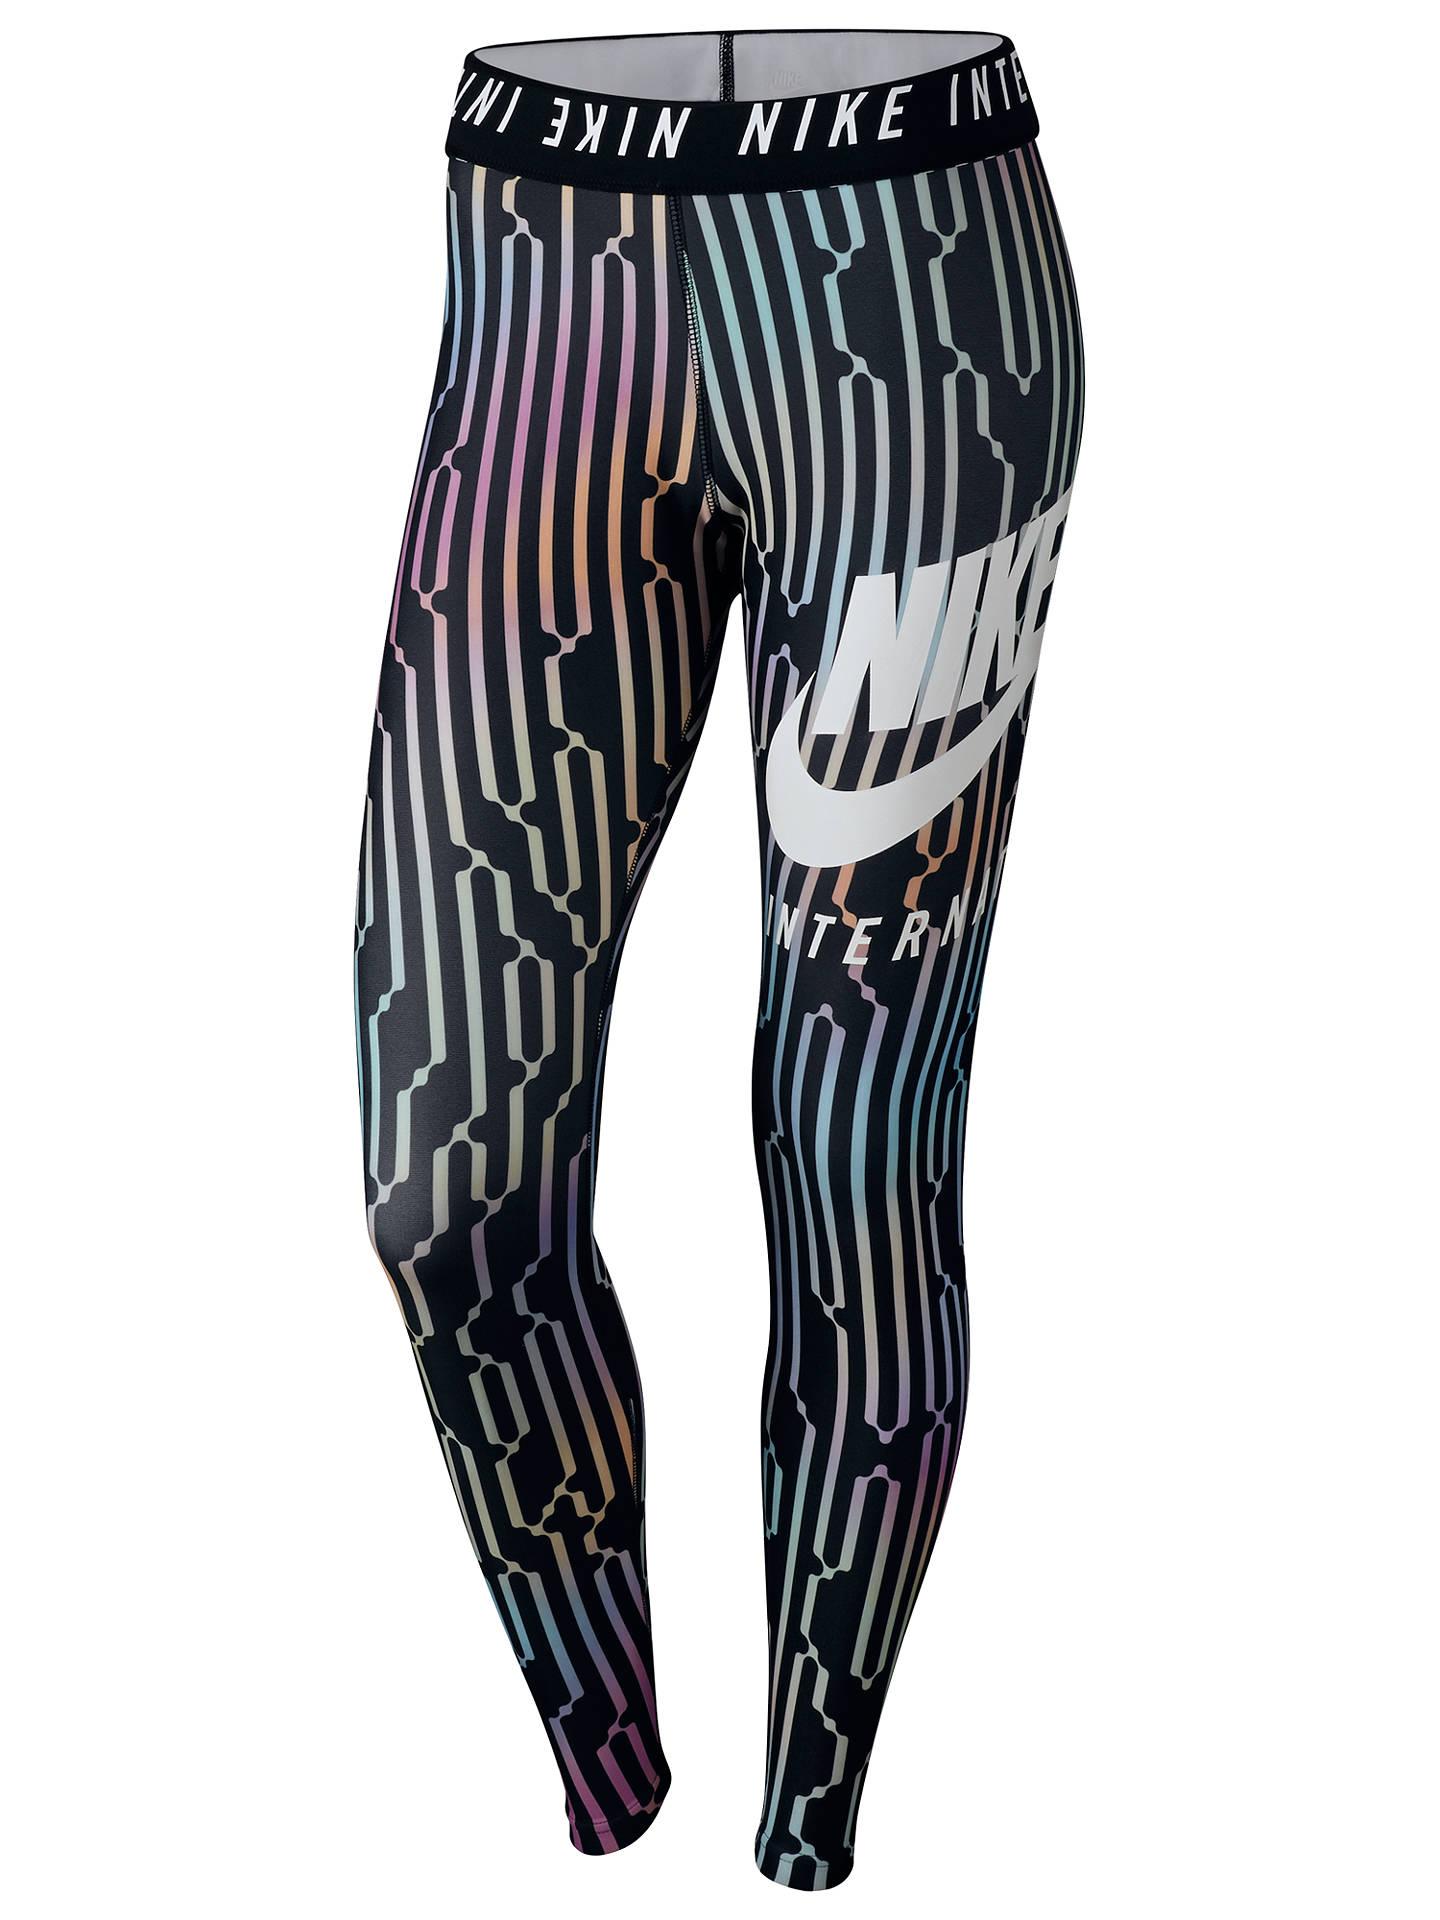 102c5b41d4925 Buy Nike International Leggings, Black/Multi, XS Online at johnlewis.com ...